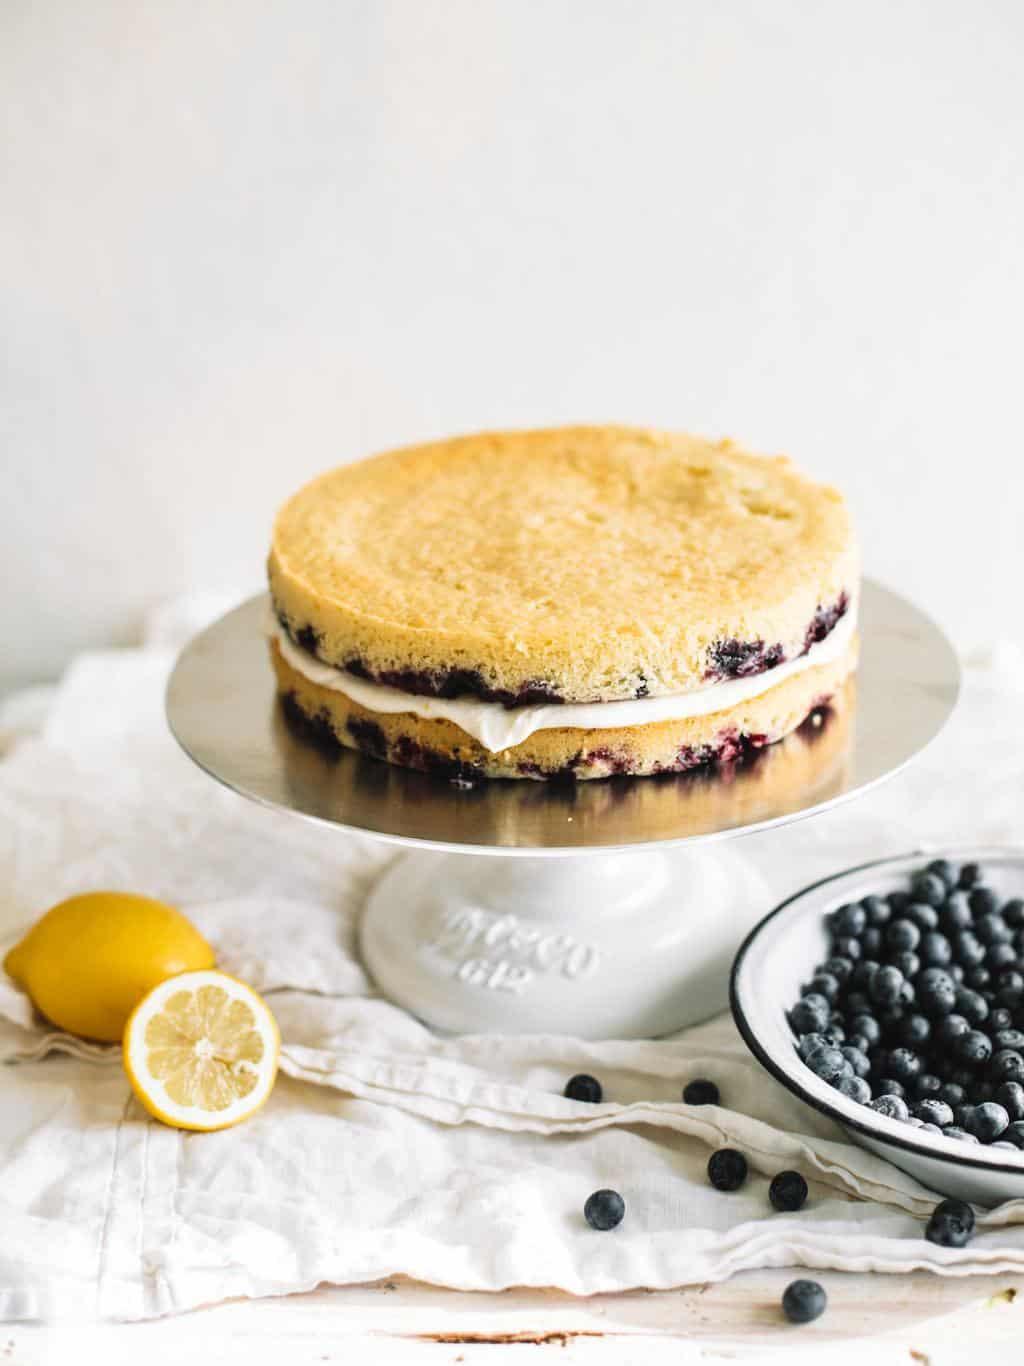 naked spring lemon cake on cake stand